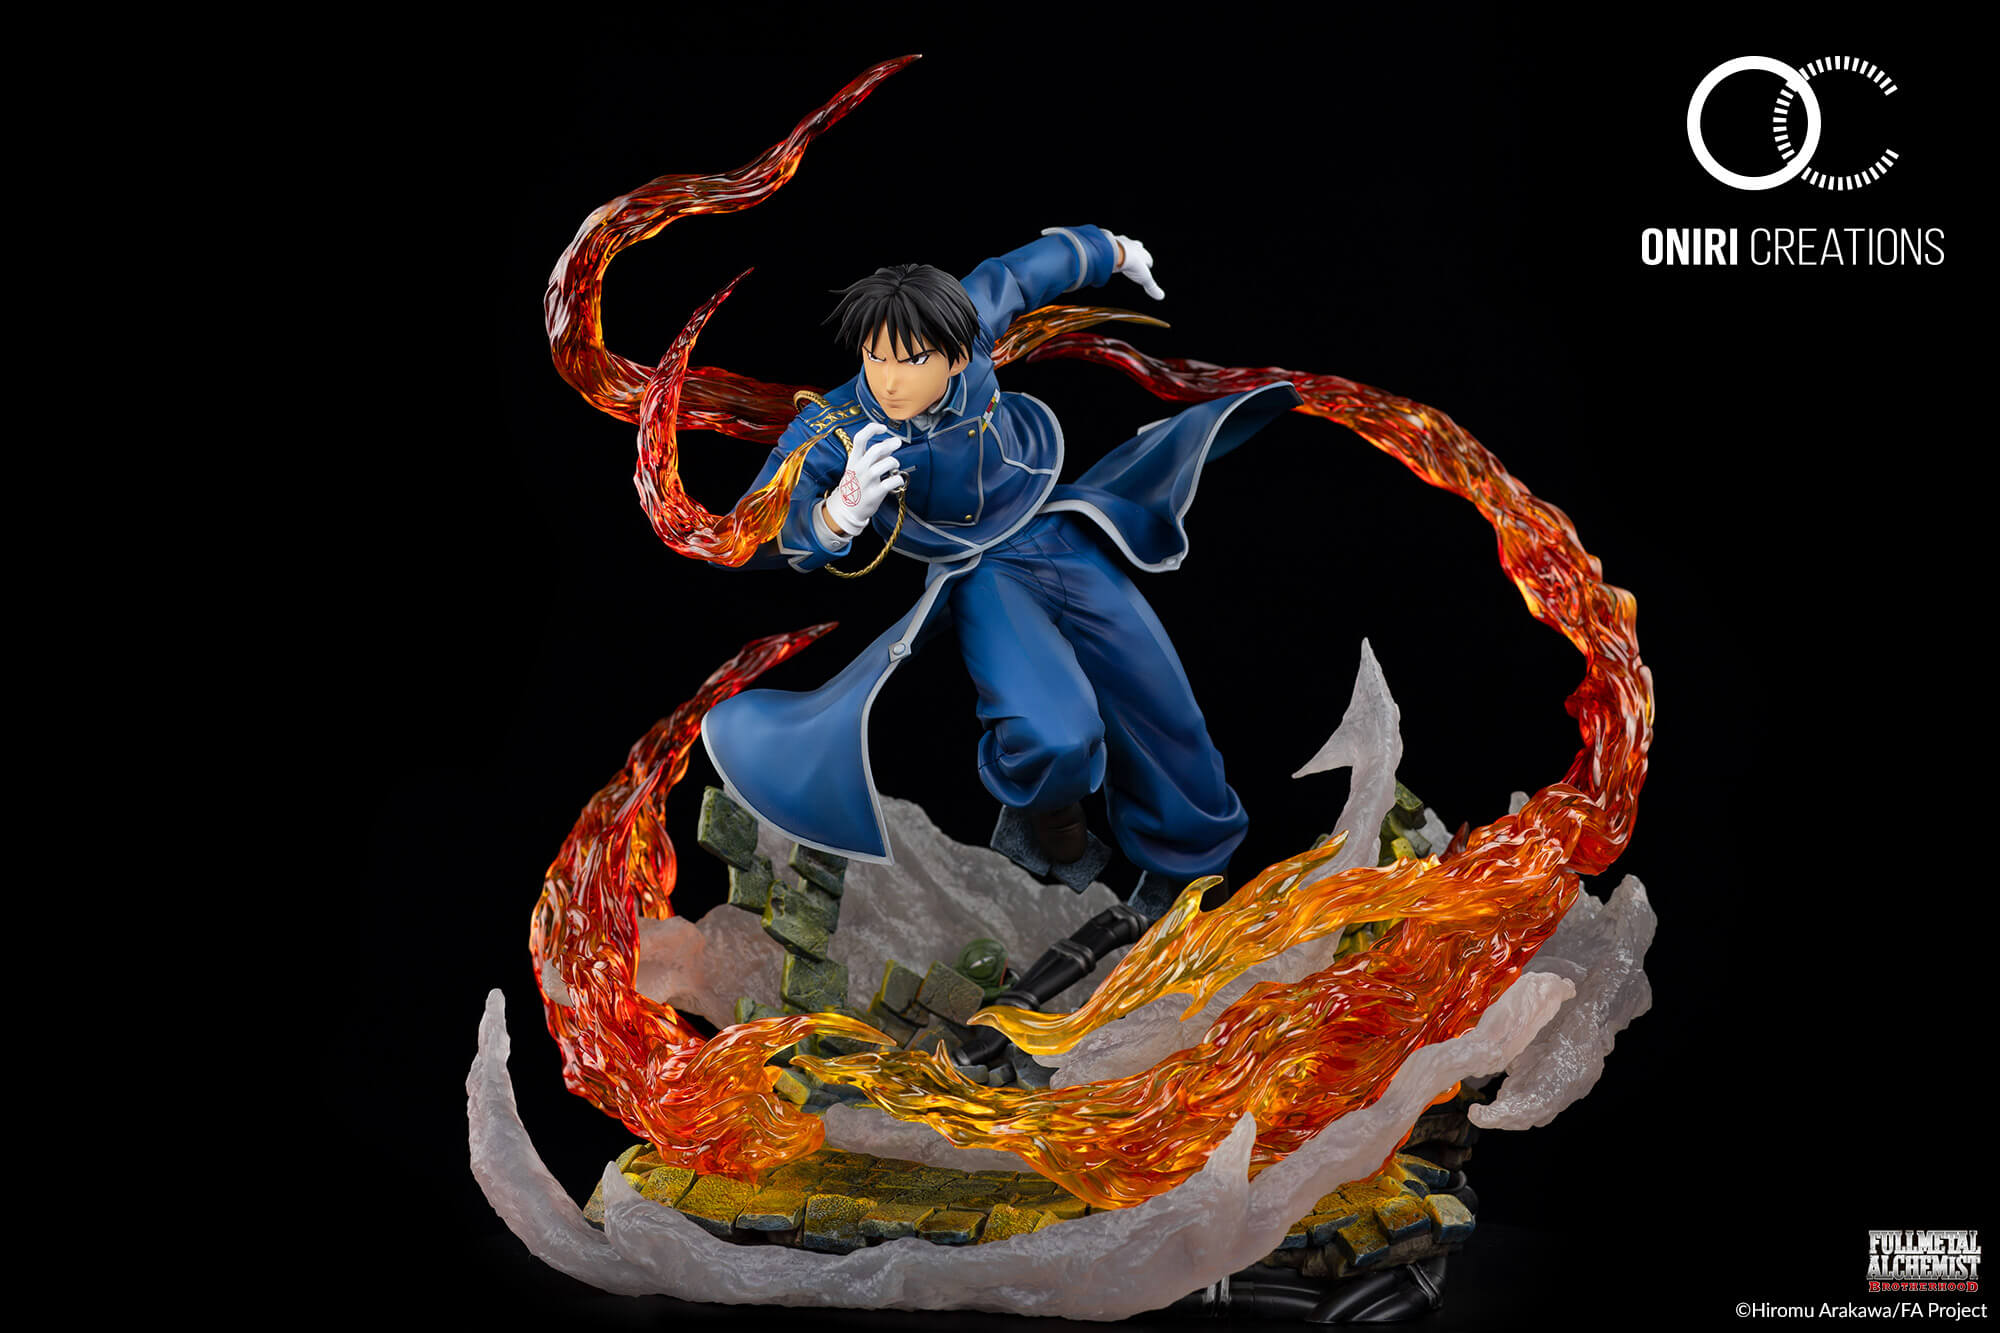 Statue Fullmetal Alchemist Roy Mustang The flame Alchemist Oniri Creations